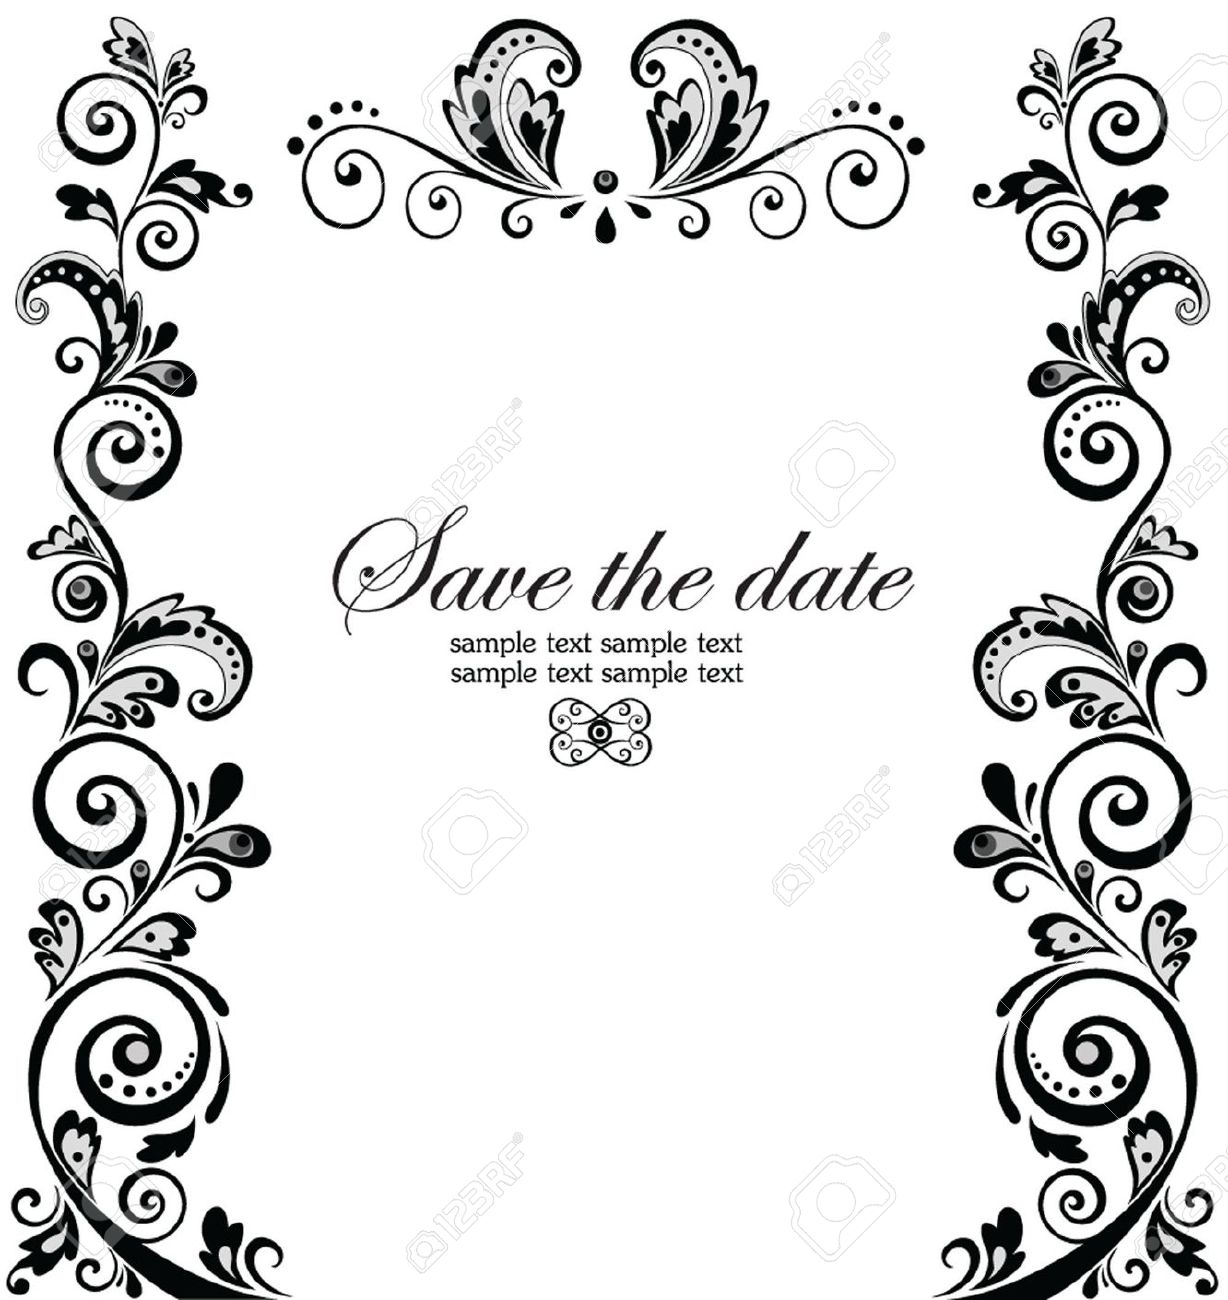 Bridal clipart border. Wedding cards borders incep